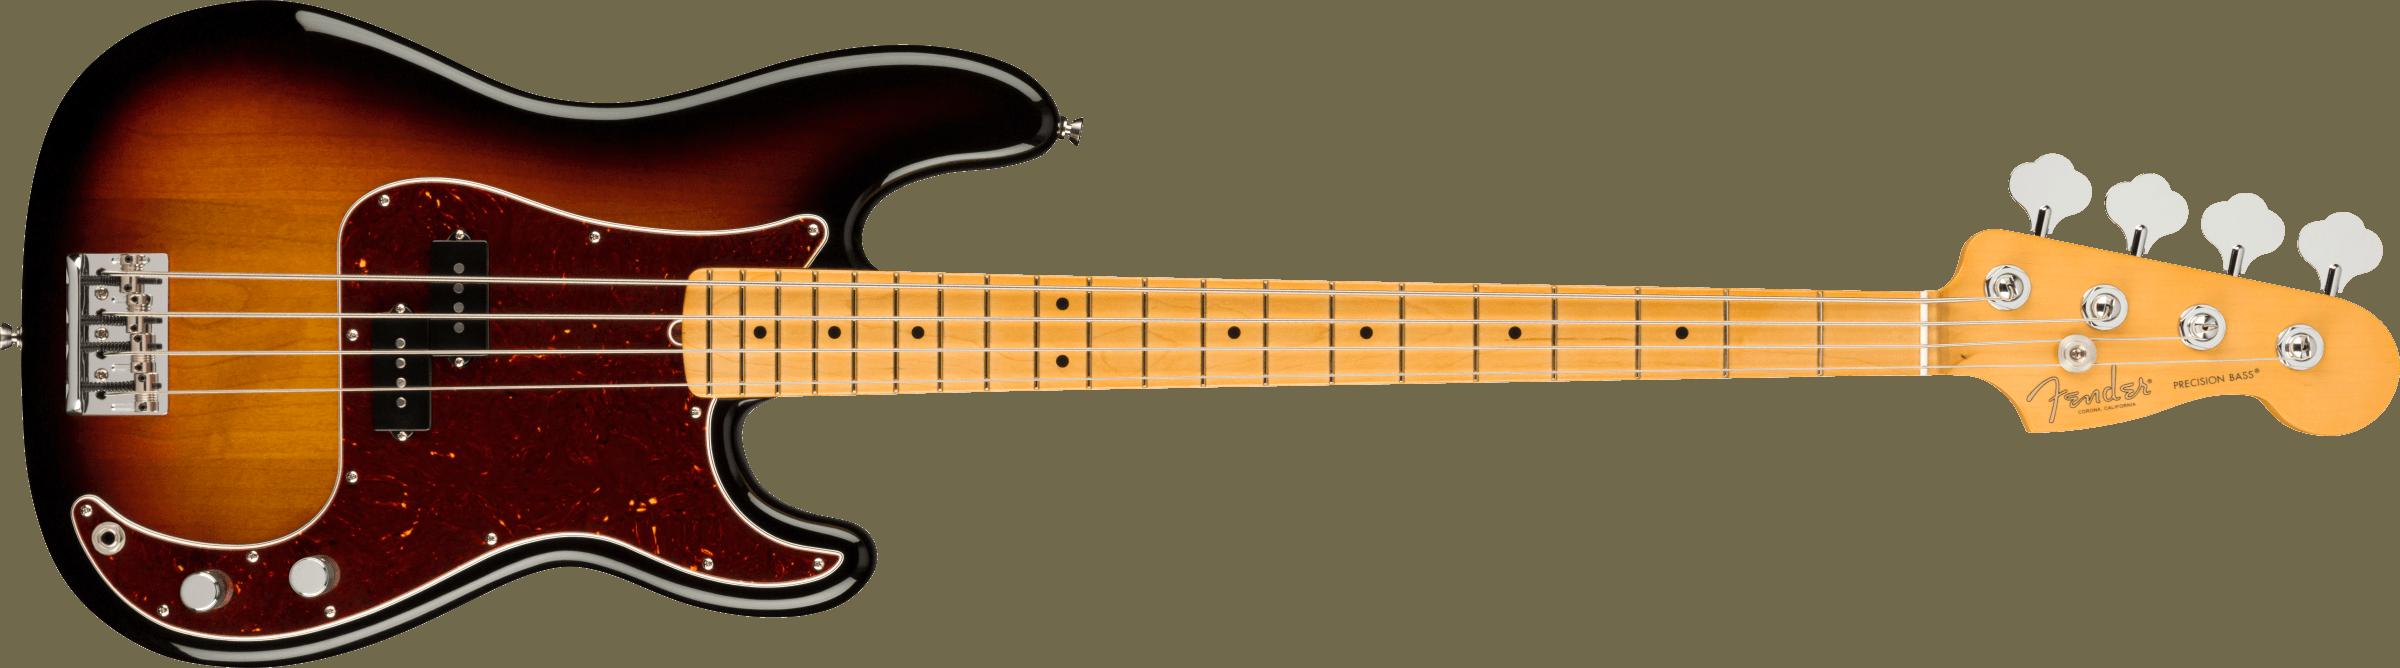 FENDER-American-Professional-II-Precision-Bass-Maple-Fingerboard-3-Color-Sunburst-sku-571005203